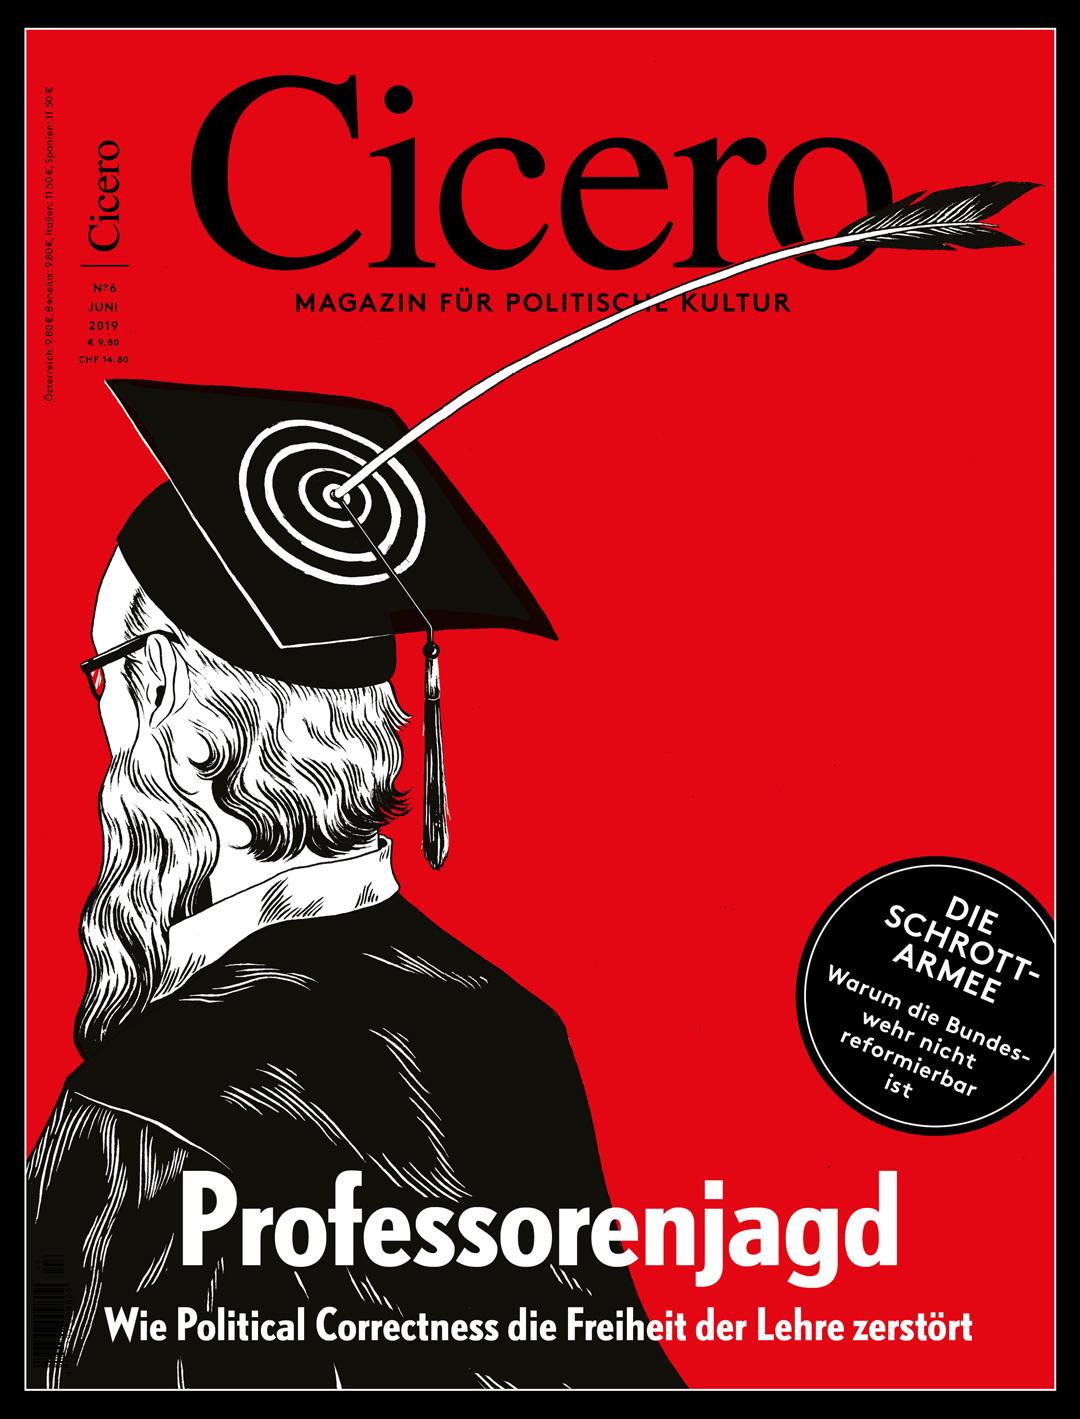 Cicero_01.jpg